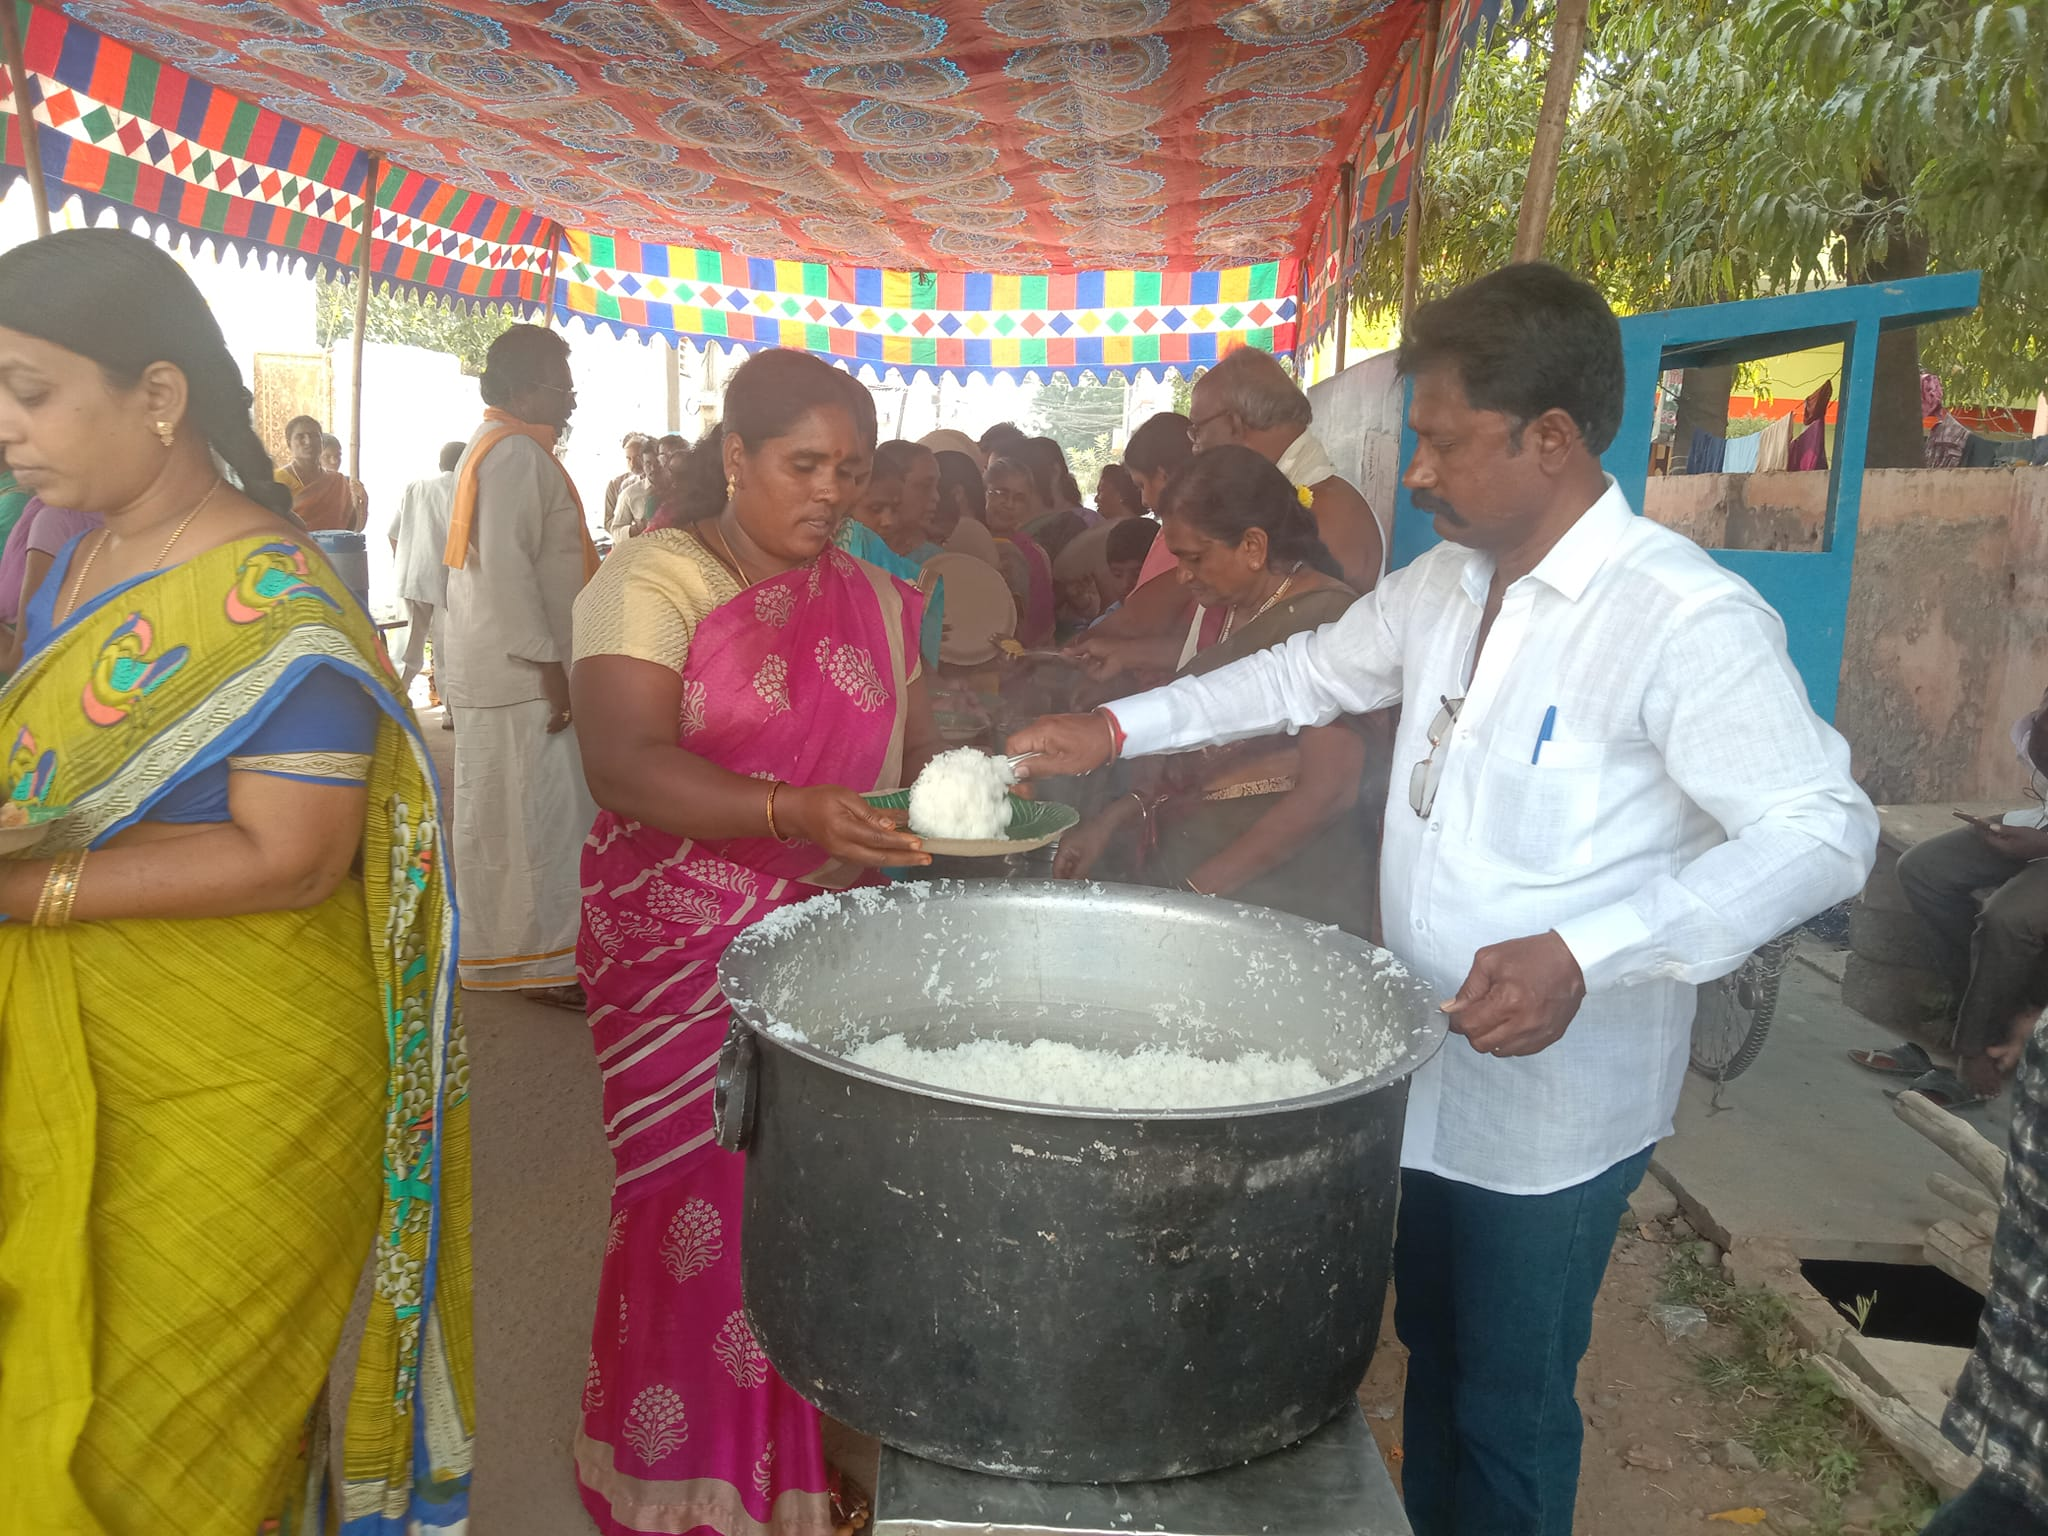 Paladugu Venkatesh Chowdary | Contested 43rd Division Corporator | Social Activist | Active Leader | Founder and the Chairman of the Paladugu Trust | Congress | INC | Akkireddygudem | Musunuru | Vijayawada | Vijayawada West | Krishna | Andhra Pradesh | theLeadersPage